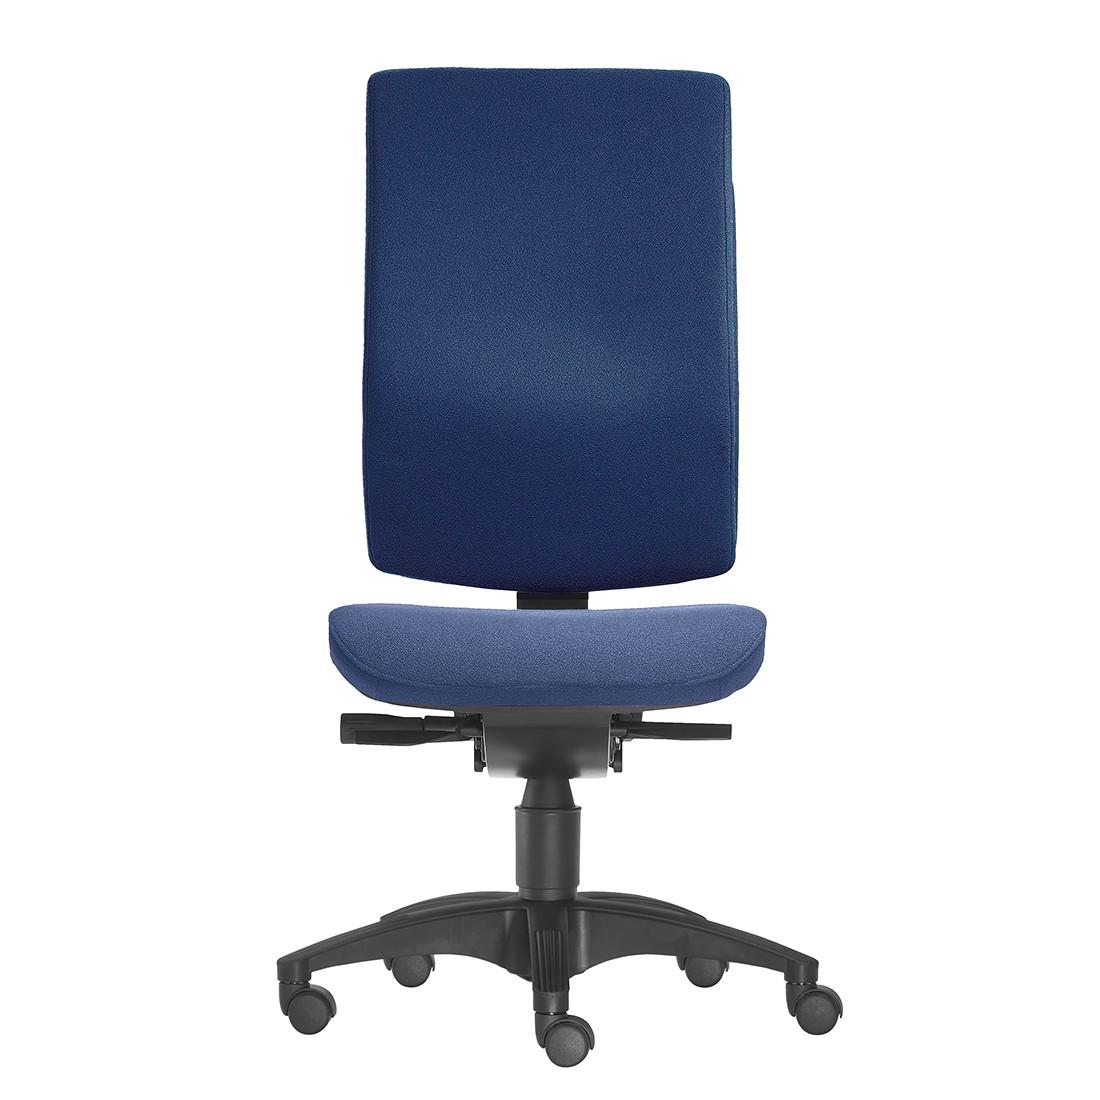 Bürodrehstuhl Cube M – Ohne Armlehnen – Dunkelblau, 1000 Stühle Gernot-M. Steifensand kaufen